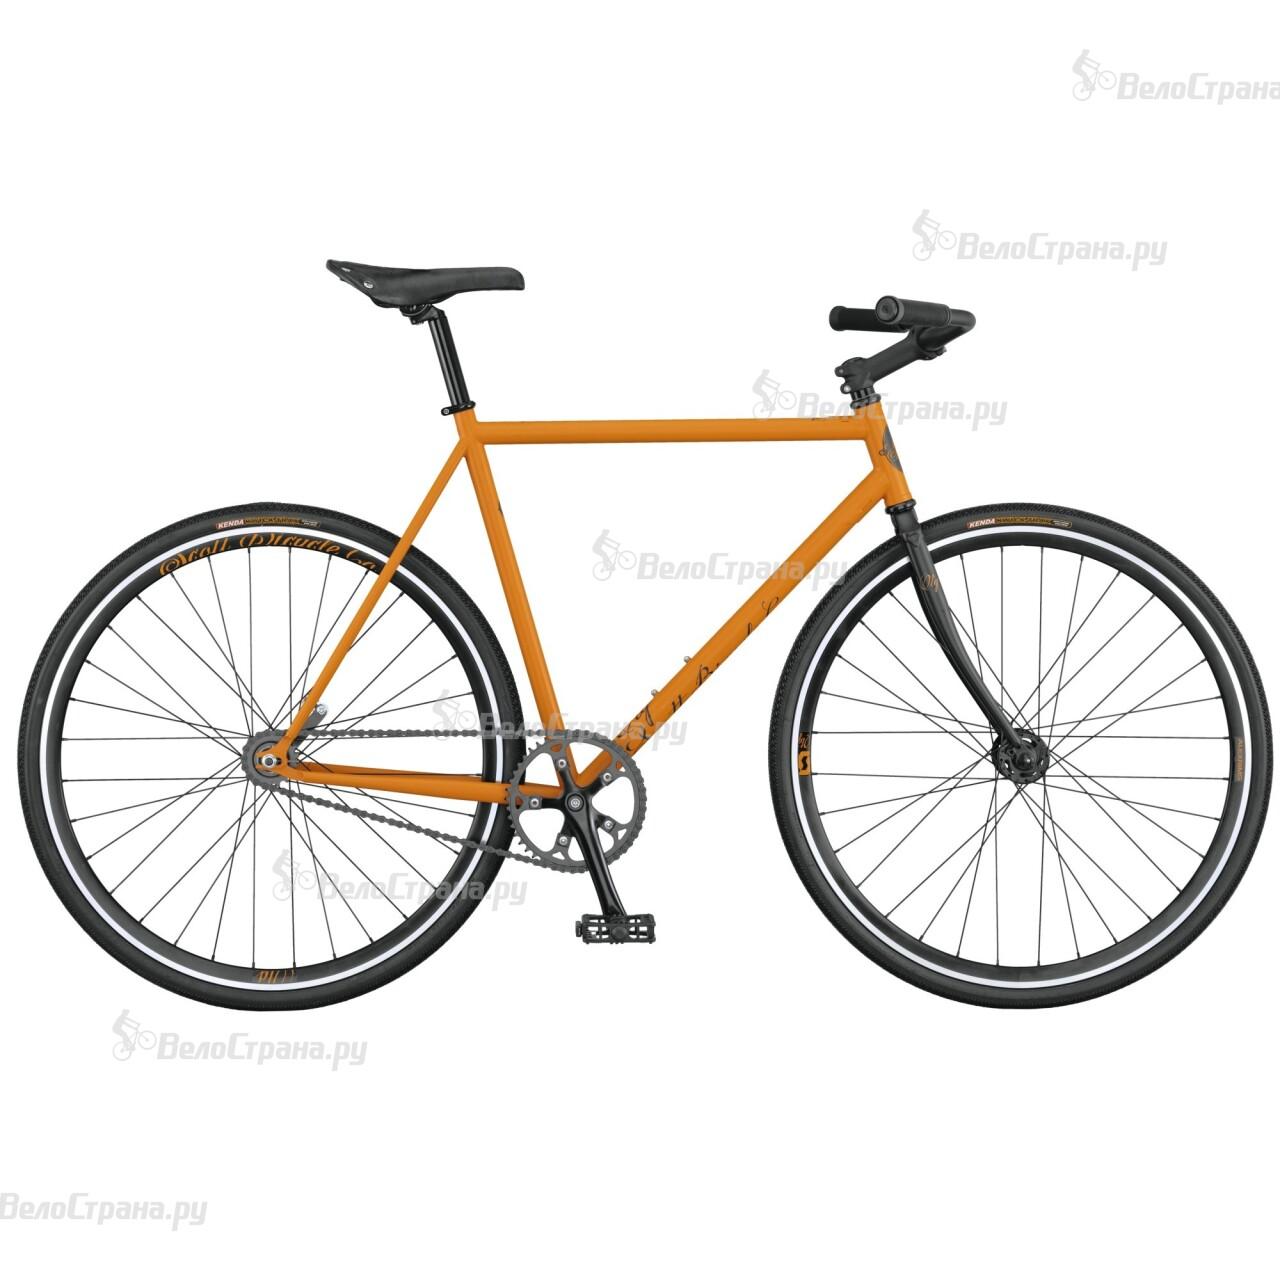 Велосипед Scott Otg 10 (2015)